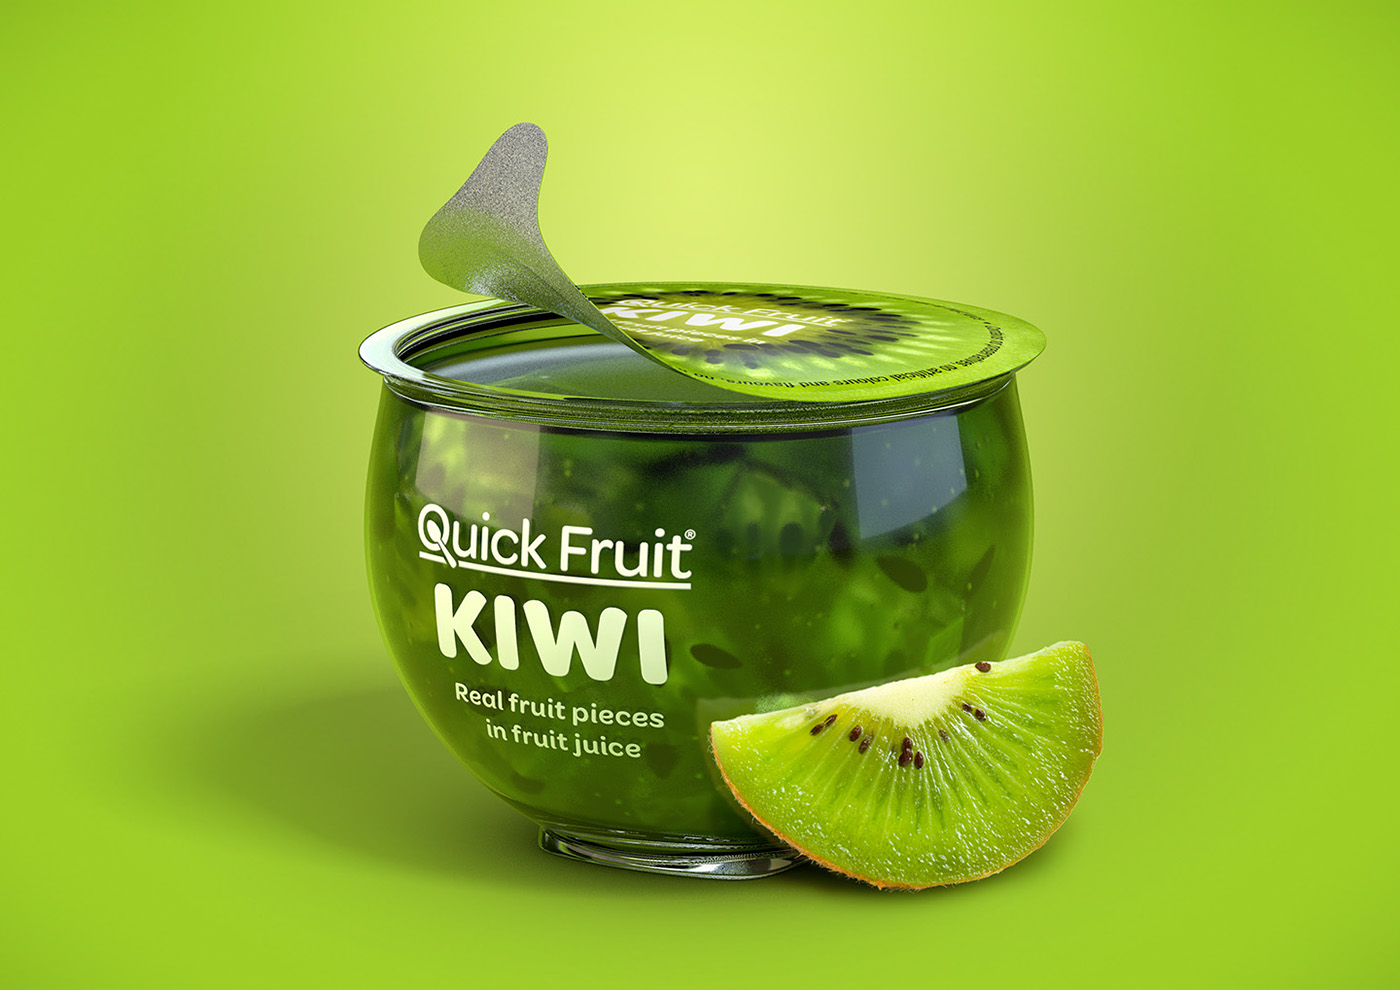 Marcel Buerkle Quick Fruit Quick Kiwi Quick Orange Quick Guava Quick packaging packaging design concept 3D renders johannesburg south africa